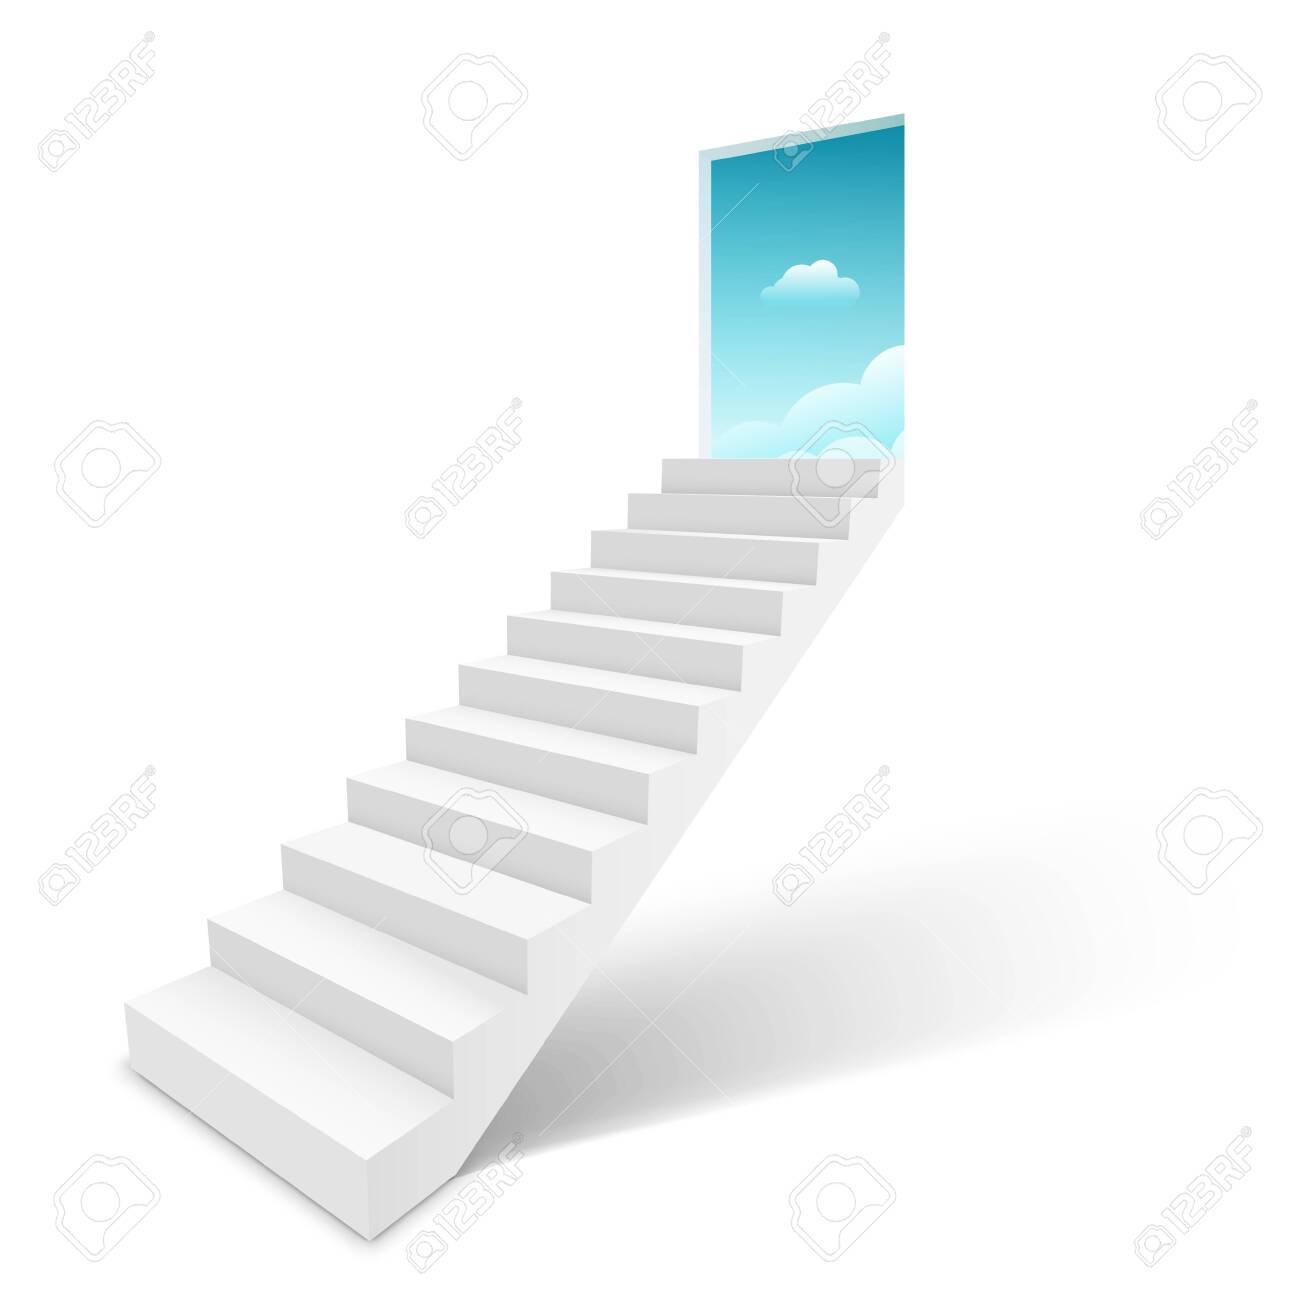 Stairway with open door heaven, ladder staircase to sky concept. - 132345690